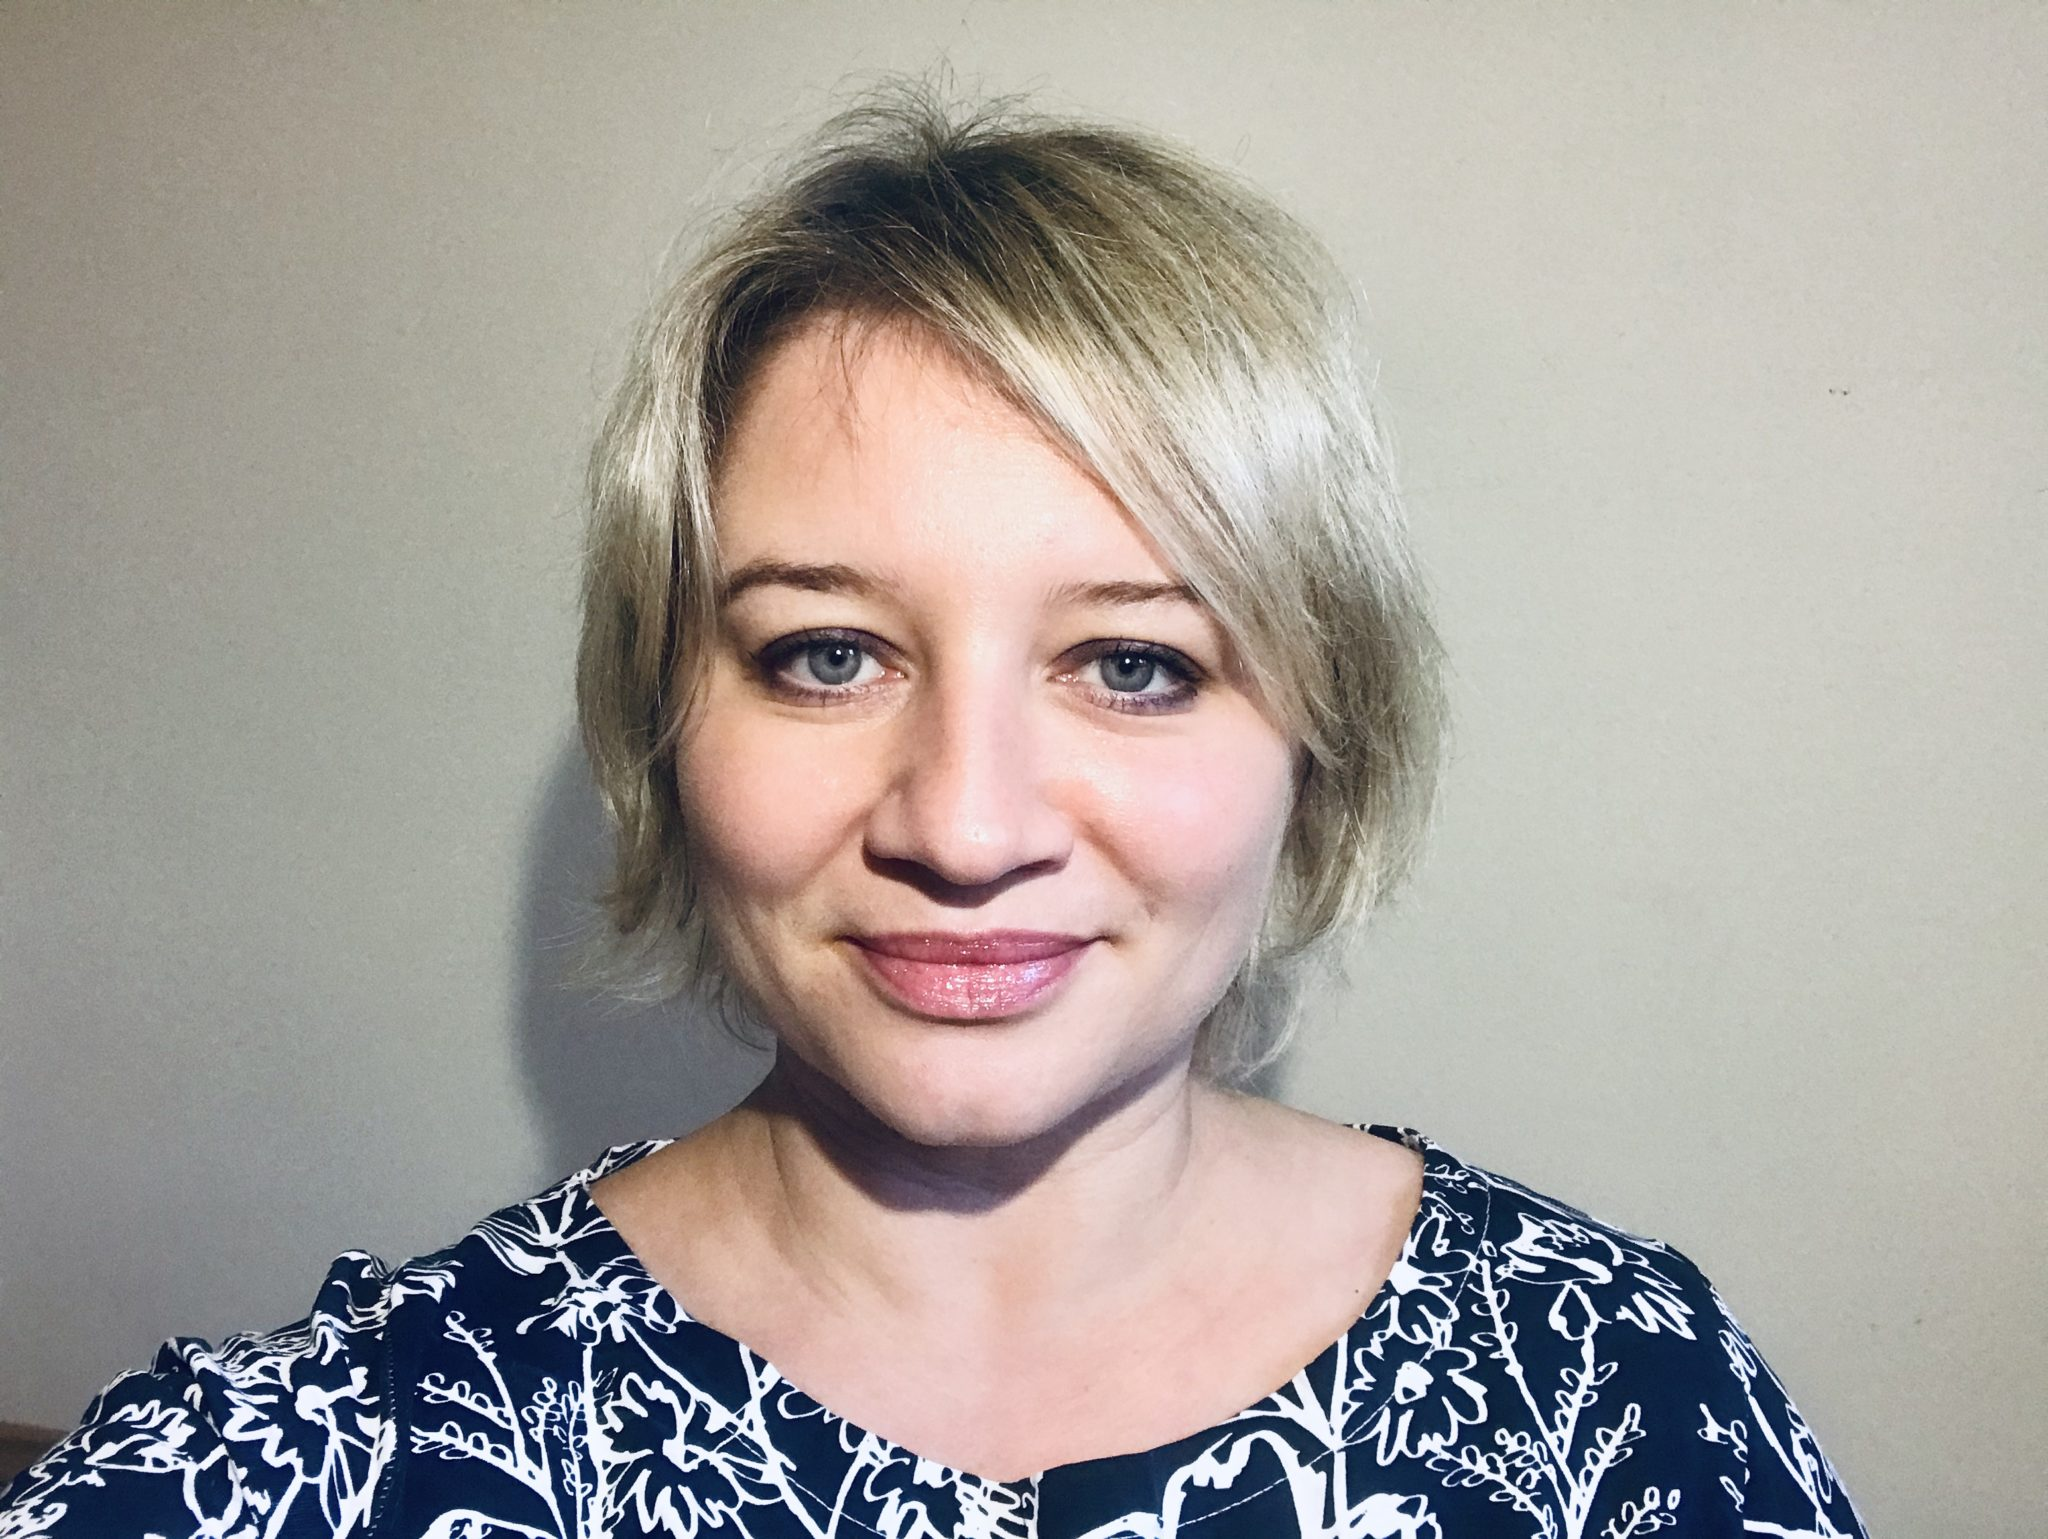 Marta Duszyńska